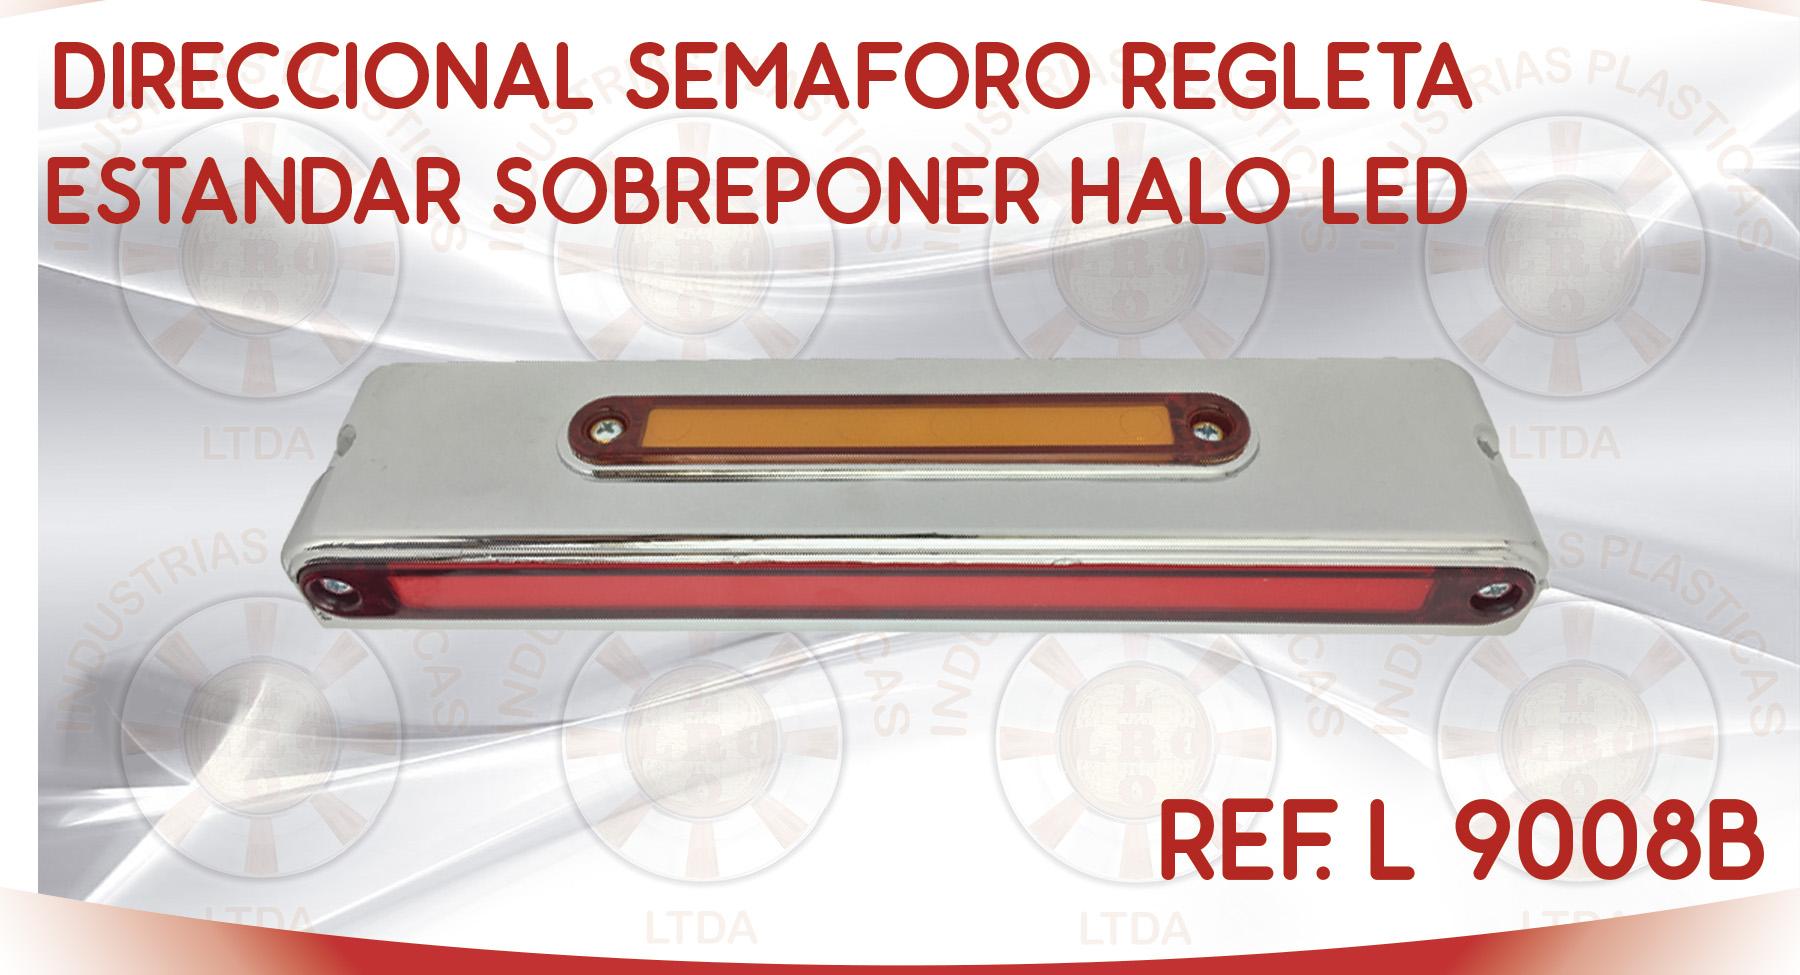 L 9008B DIRECCIONAL SEMAFORO REGLETA ESTANDAR SOBREPONER HALO LED